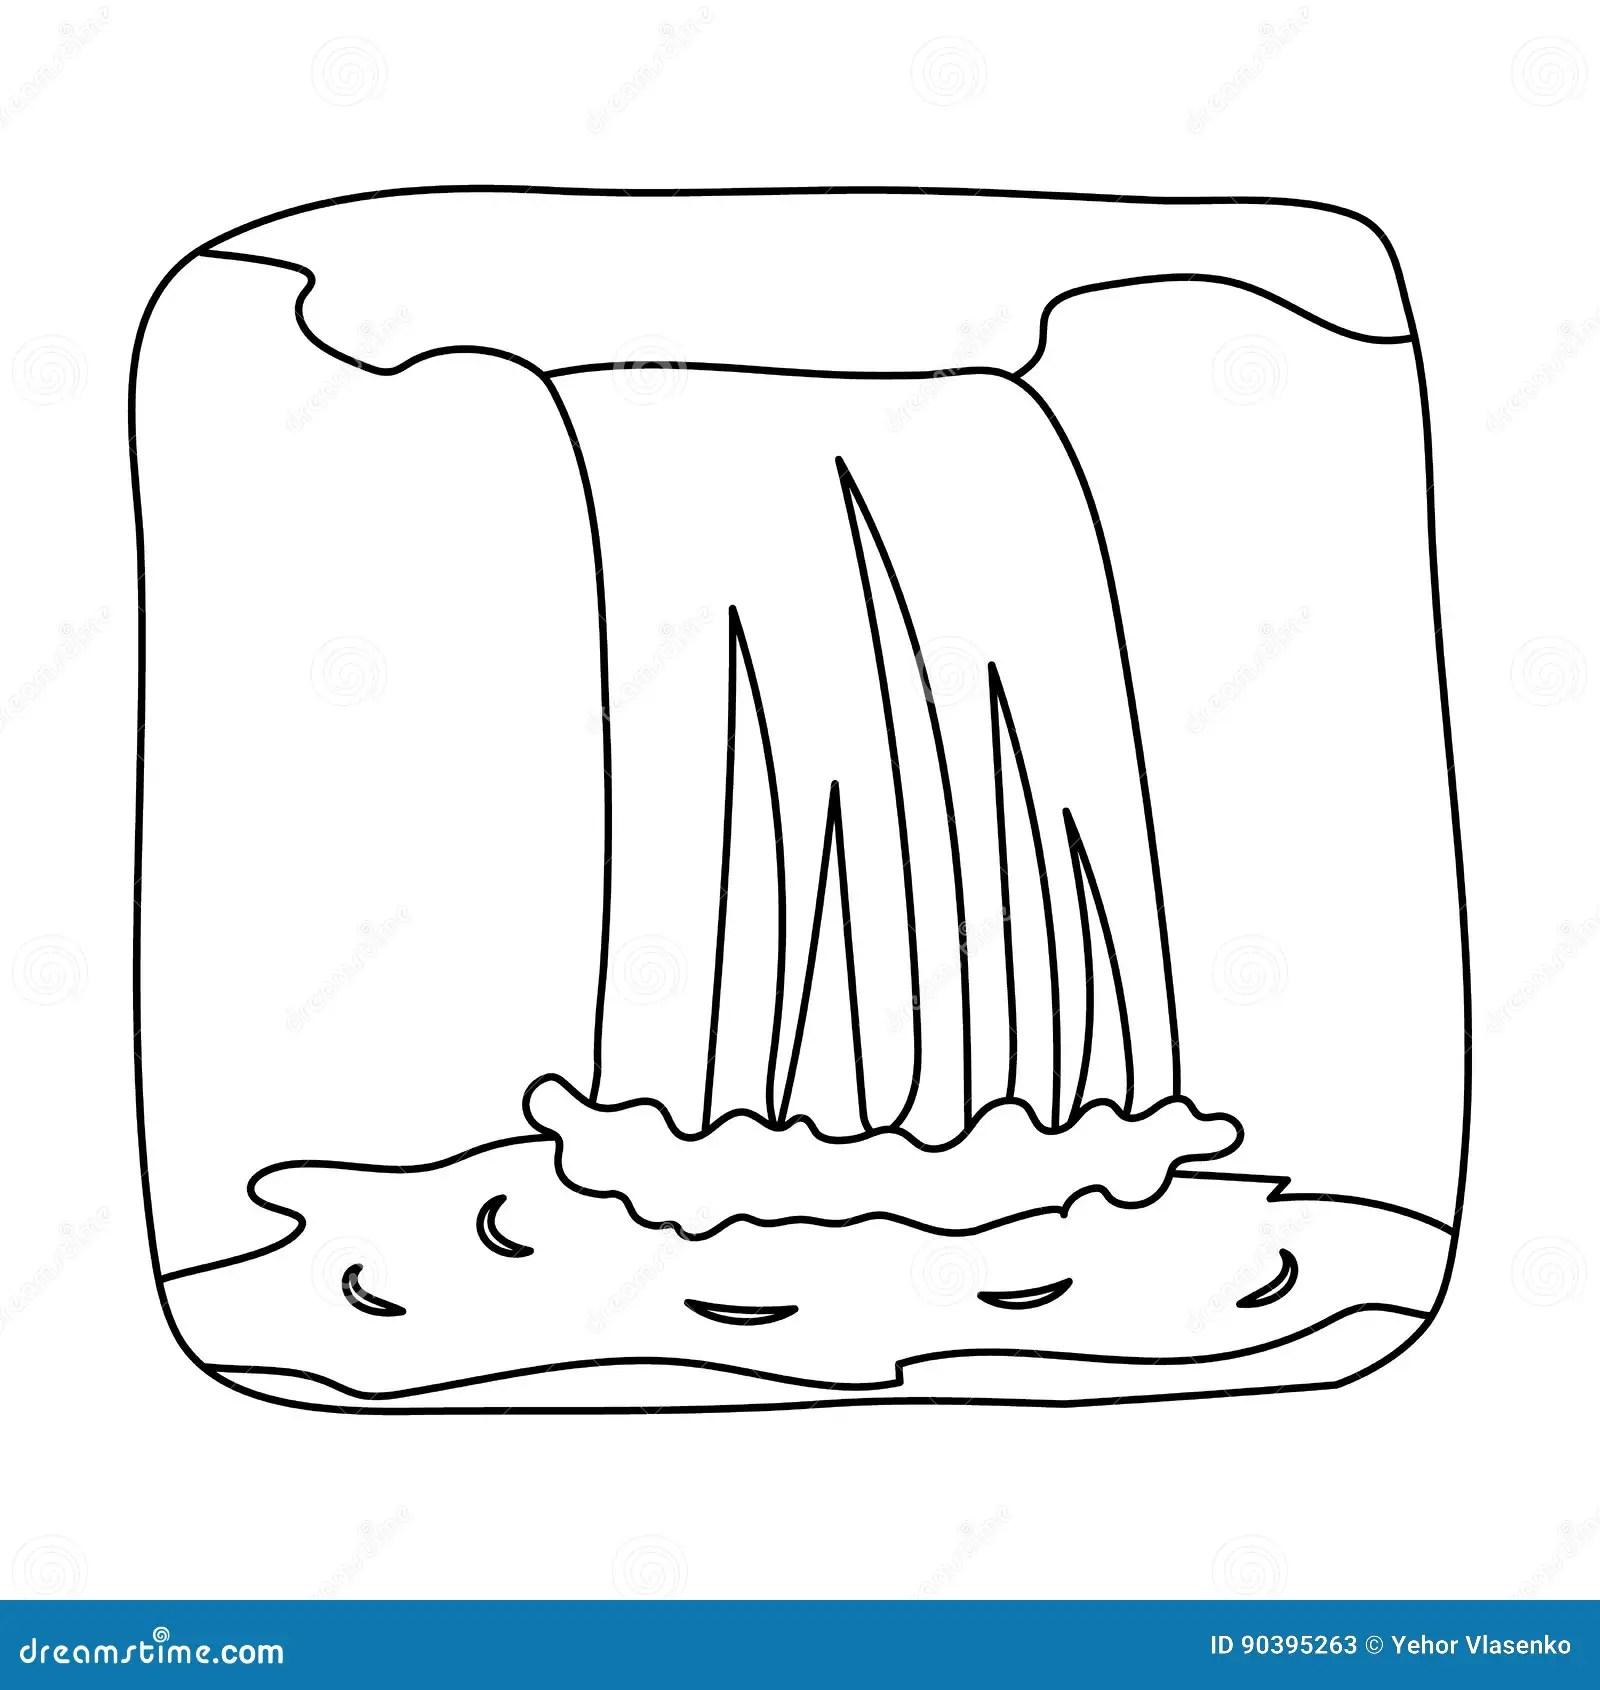 Pump For Pond Waterfalls Design